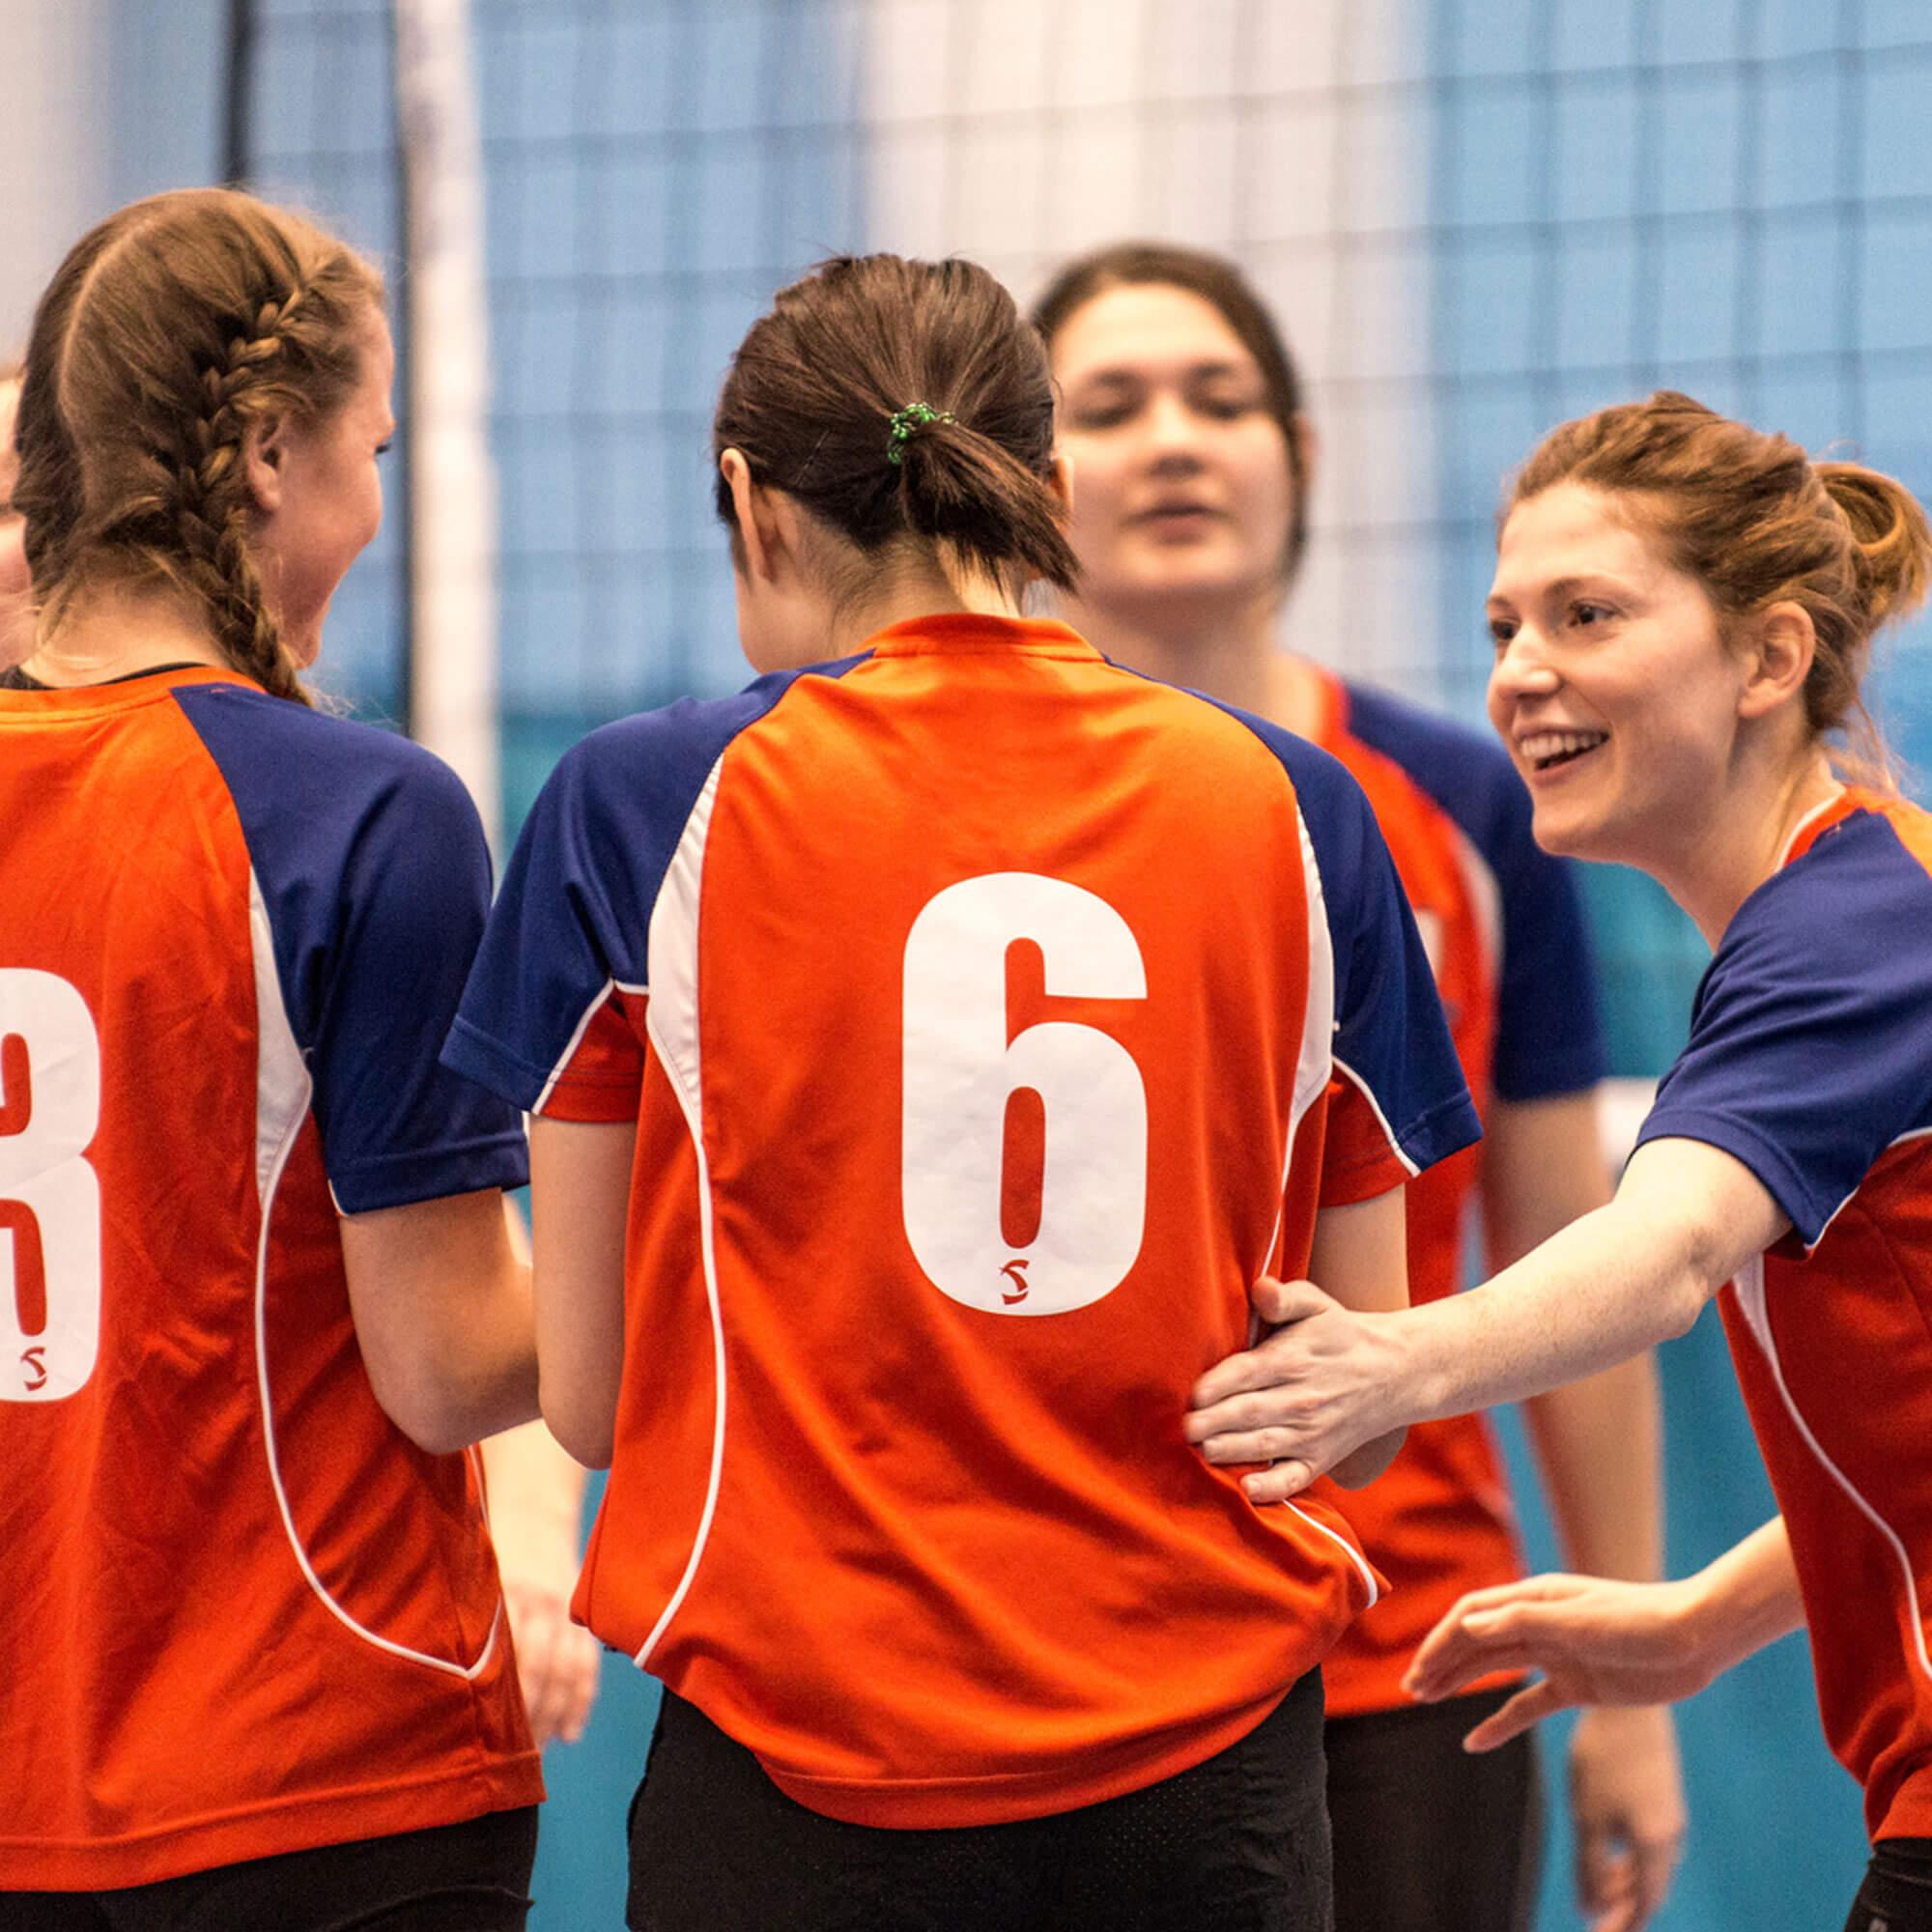 Scholarship volleyball female team - group celebration